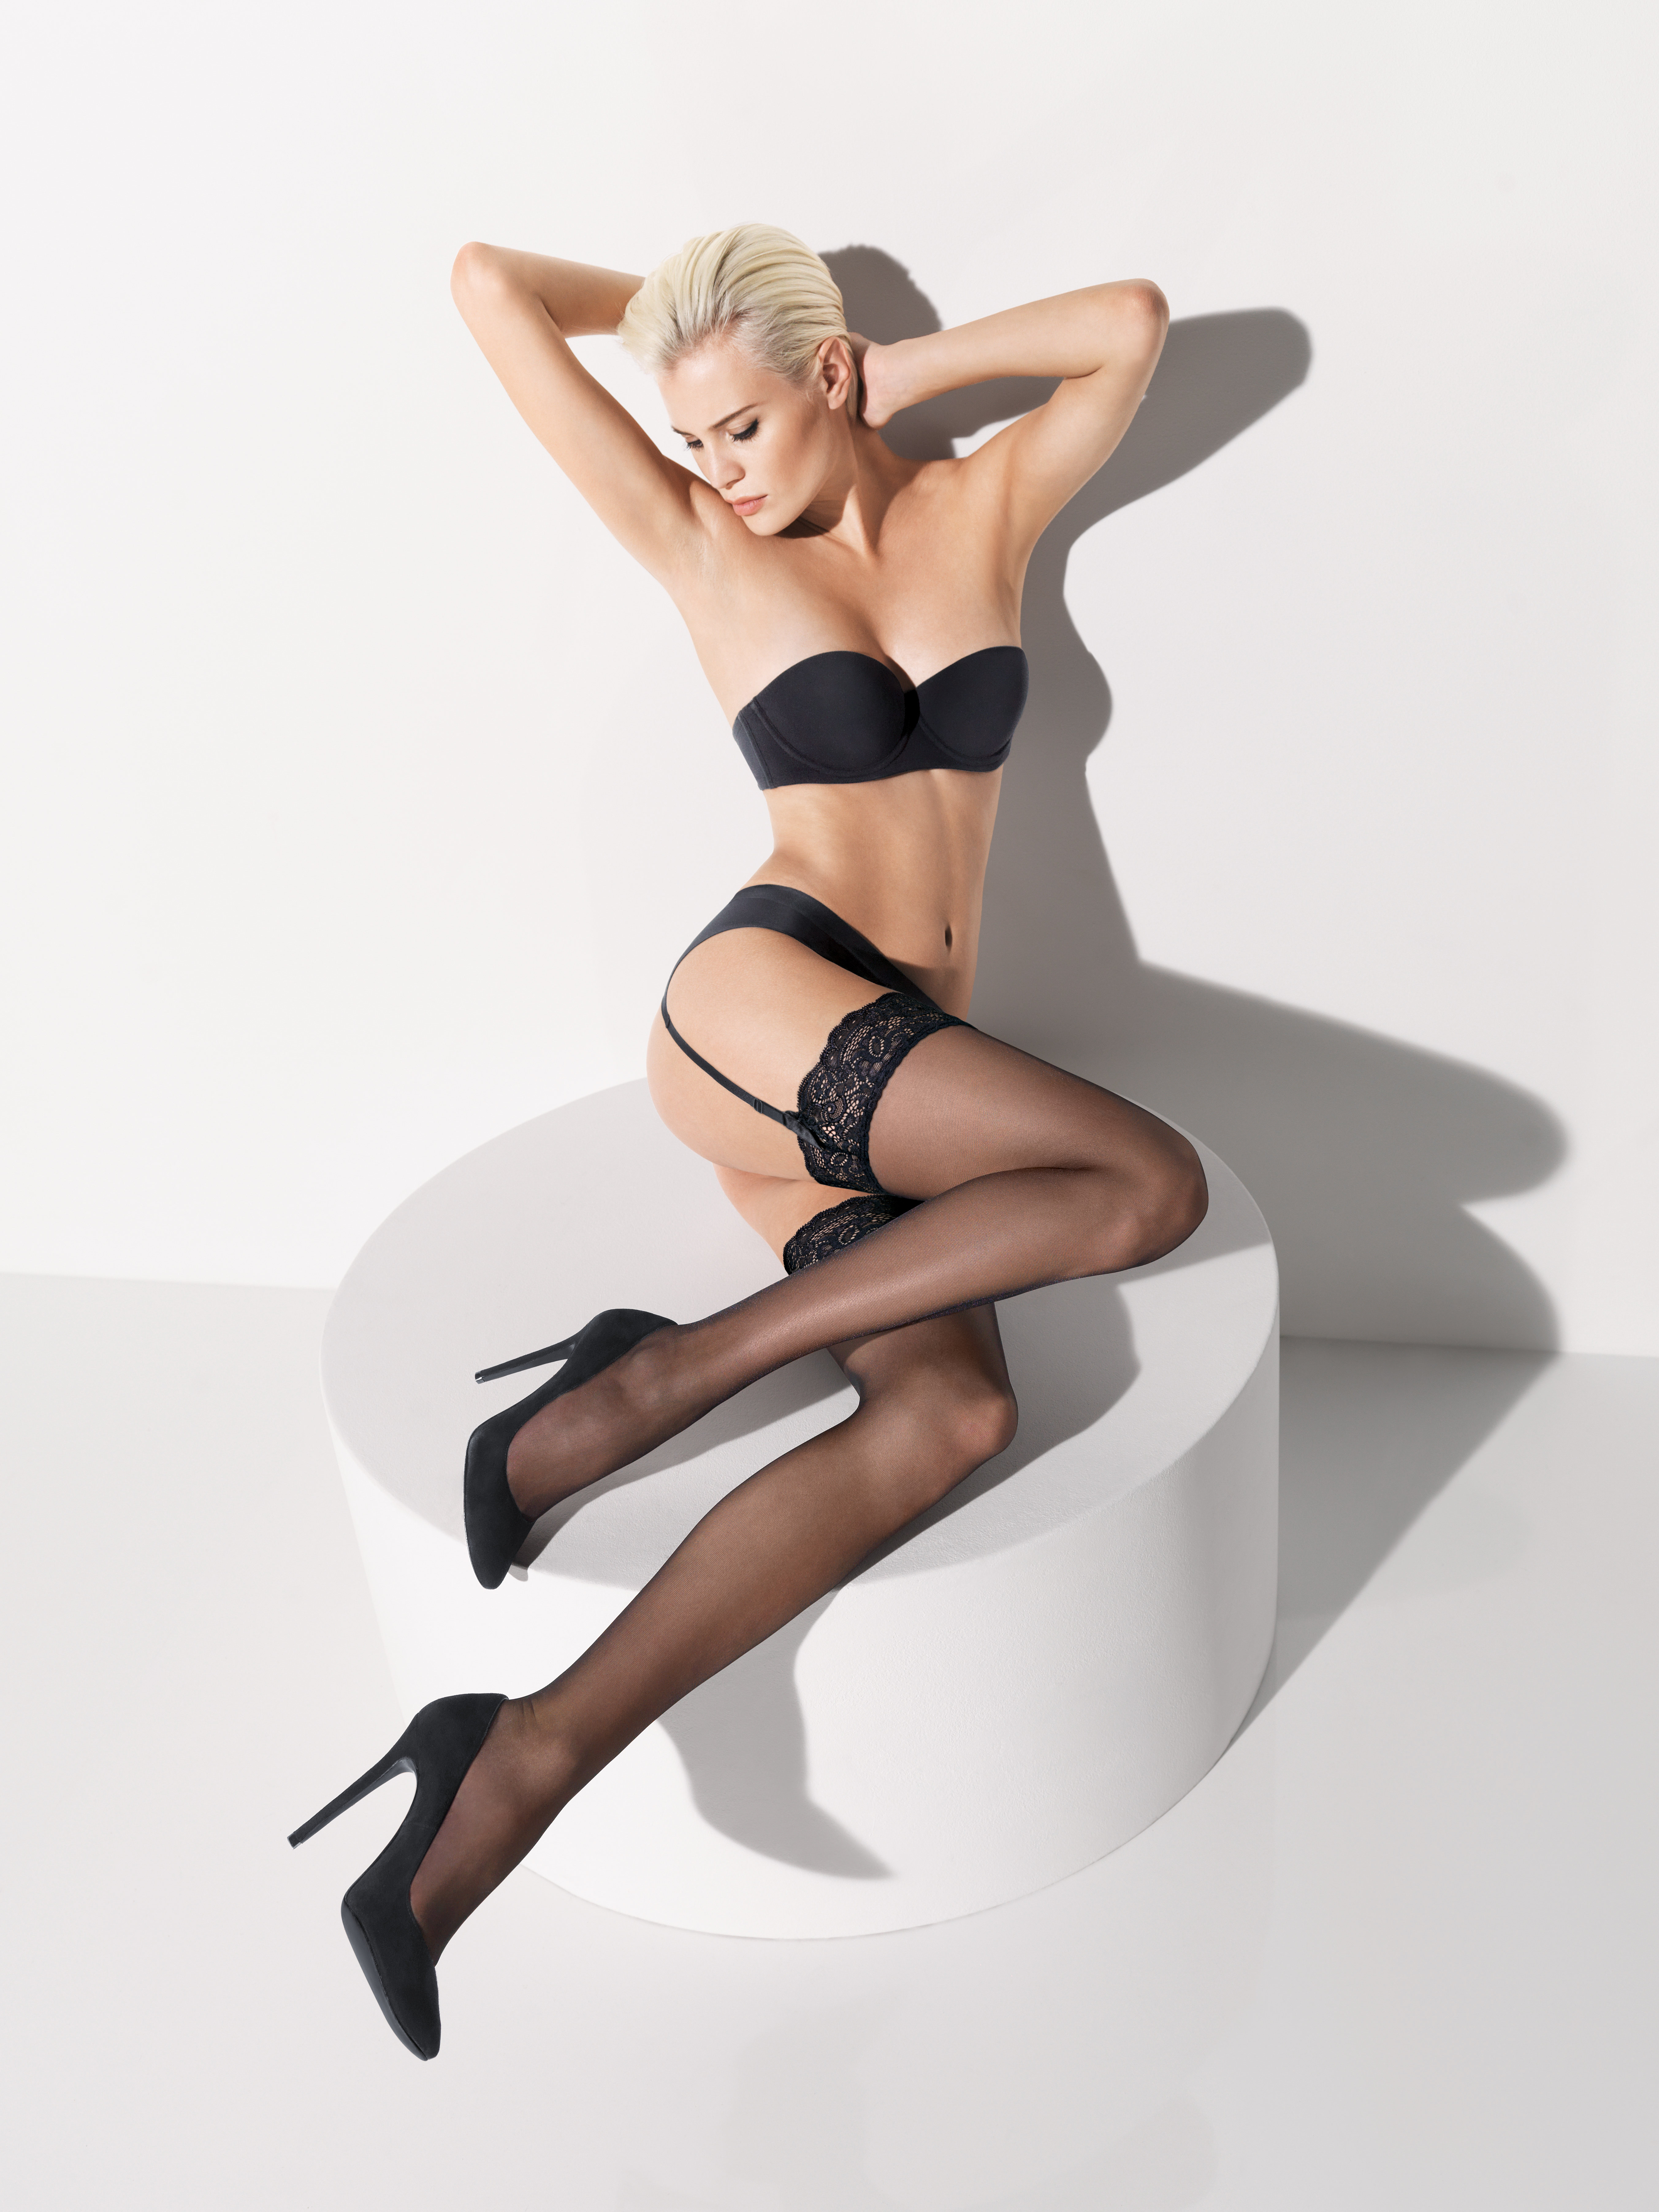 Affaire 10 Stockings - 7005 - M